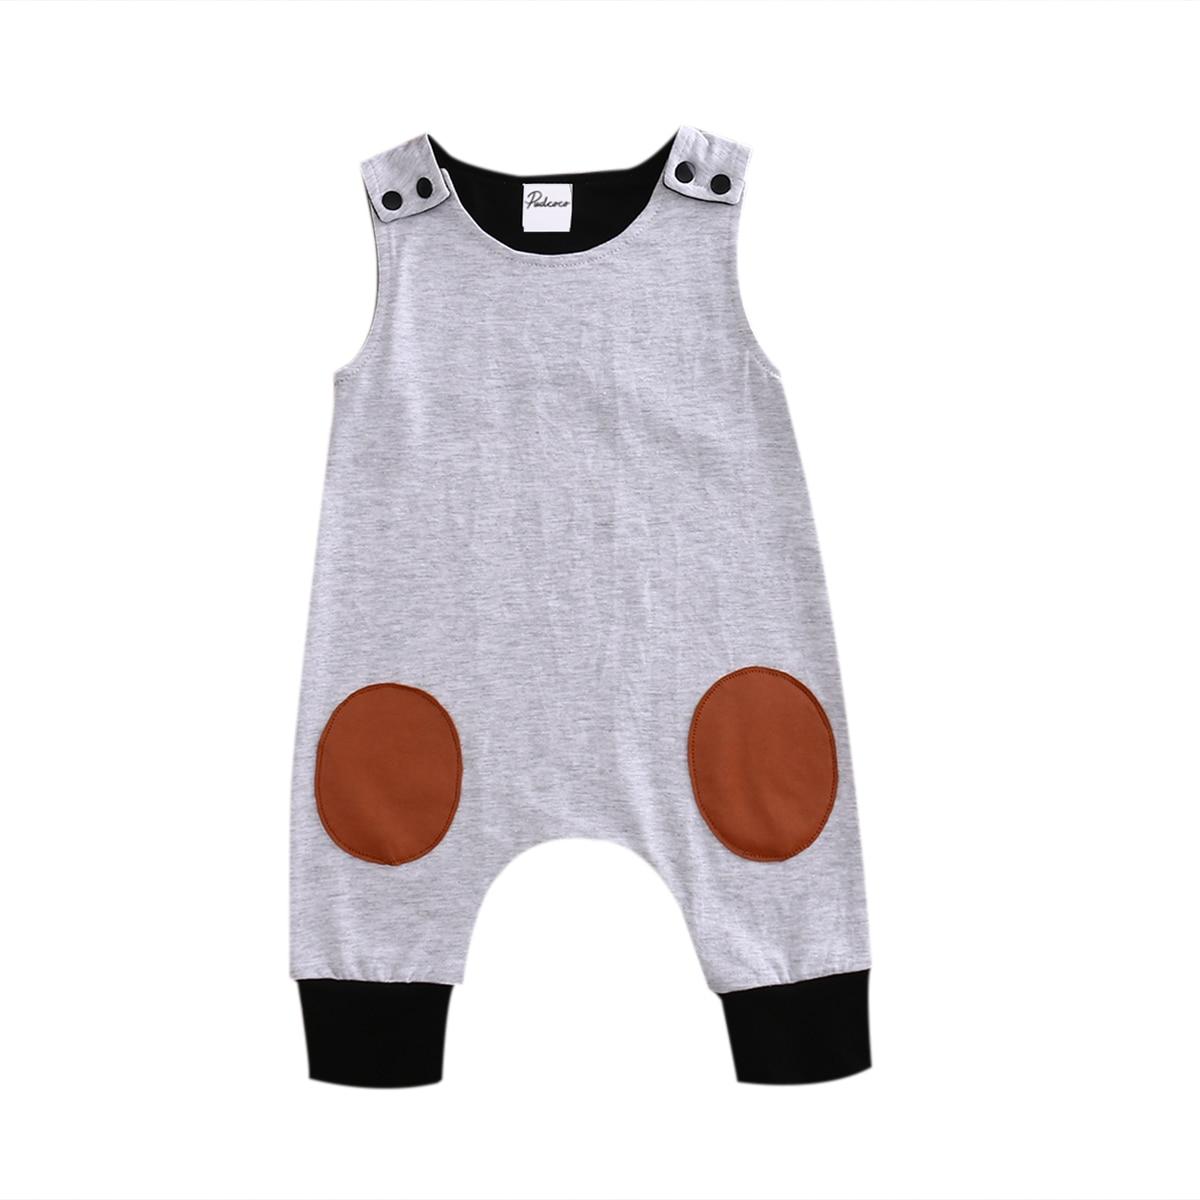 Pudcoco Newborn Baby Girl Boy Romper Jumpsuit Hat Outfits Set Clothes 0-24M